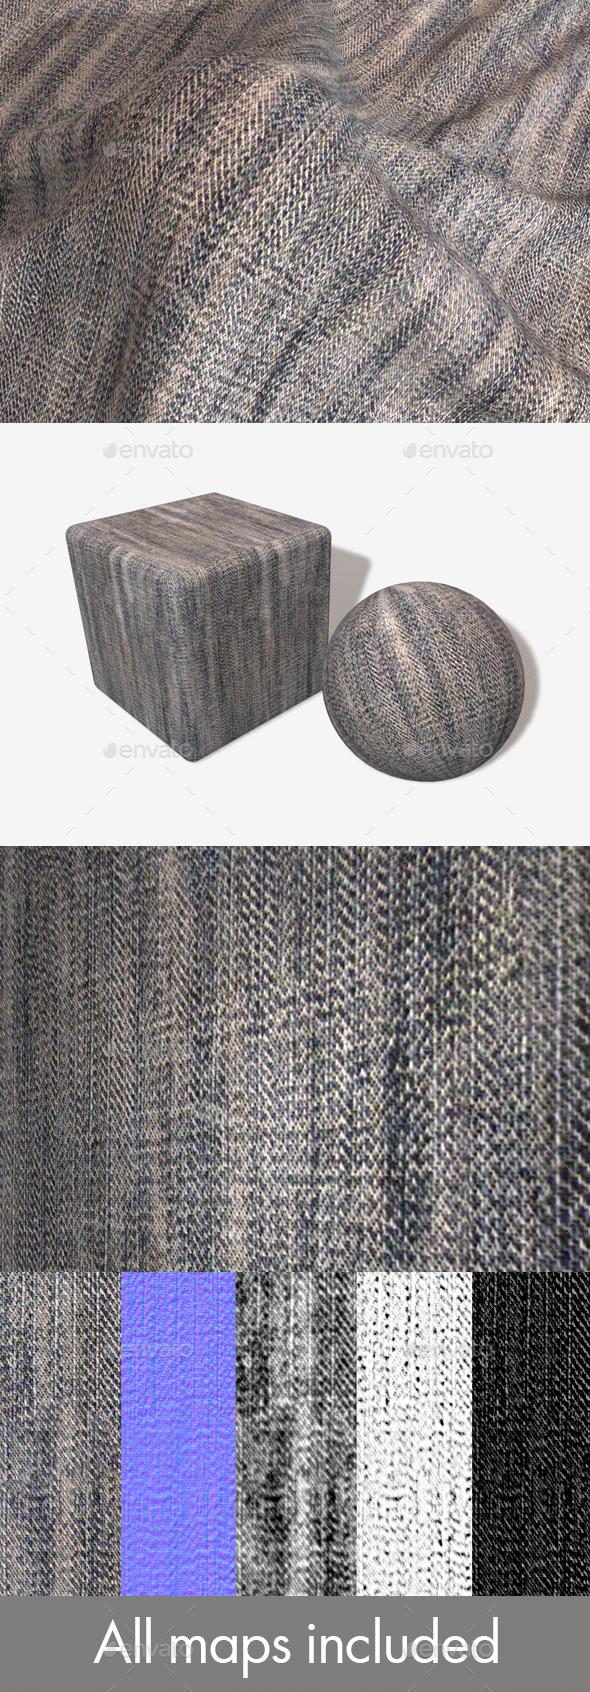 3DOcean Worn Denim Seamless Texture 19798419